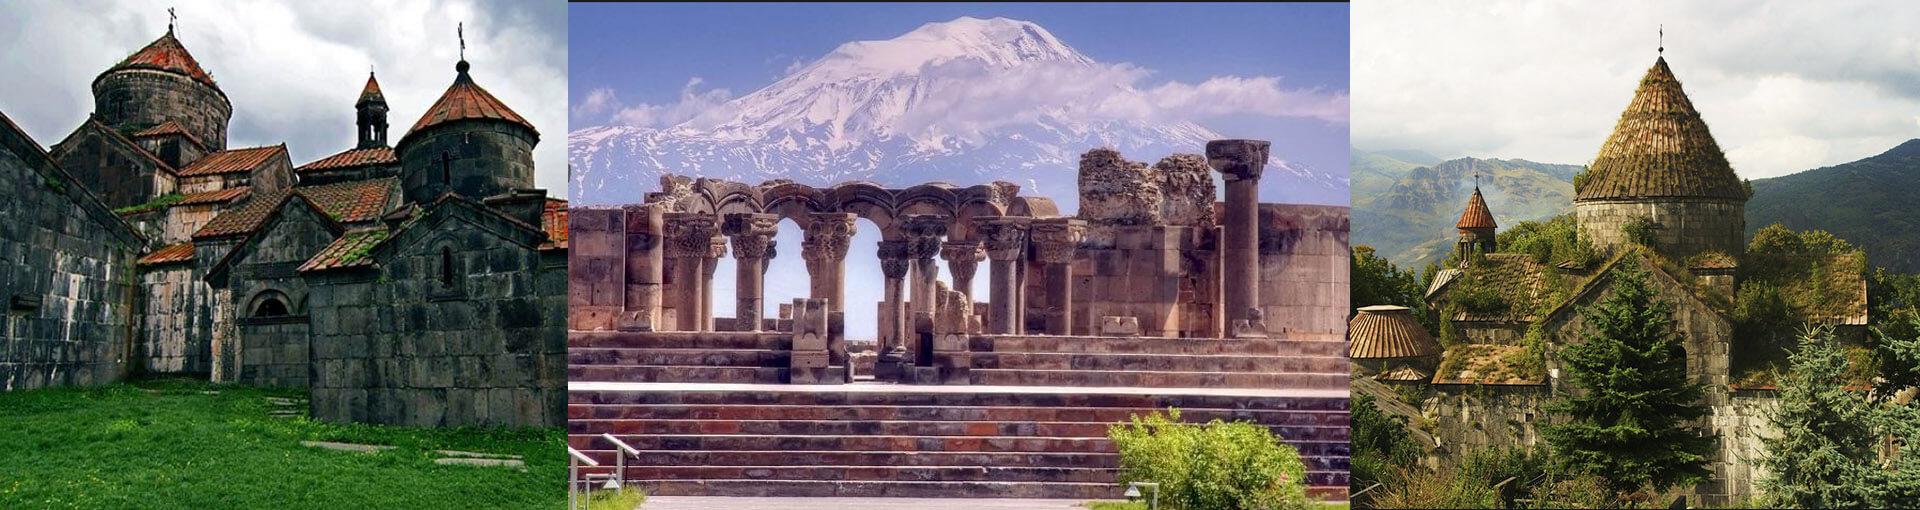 UNESCO World Heritage Sites in Armenia